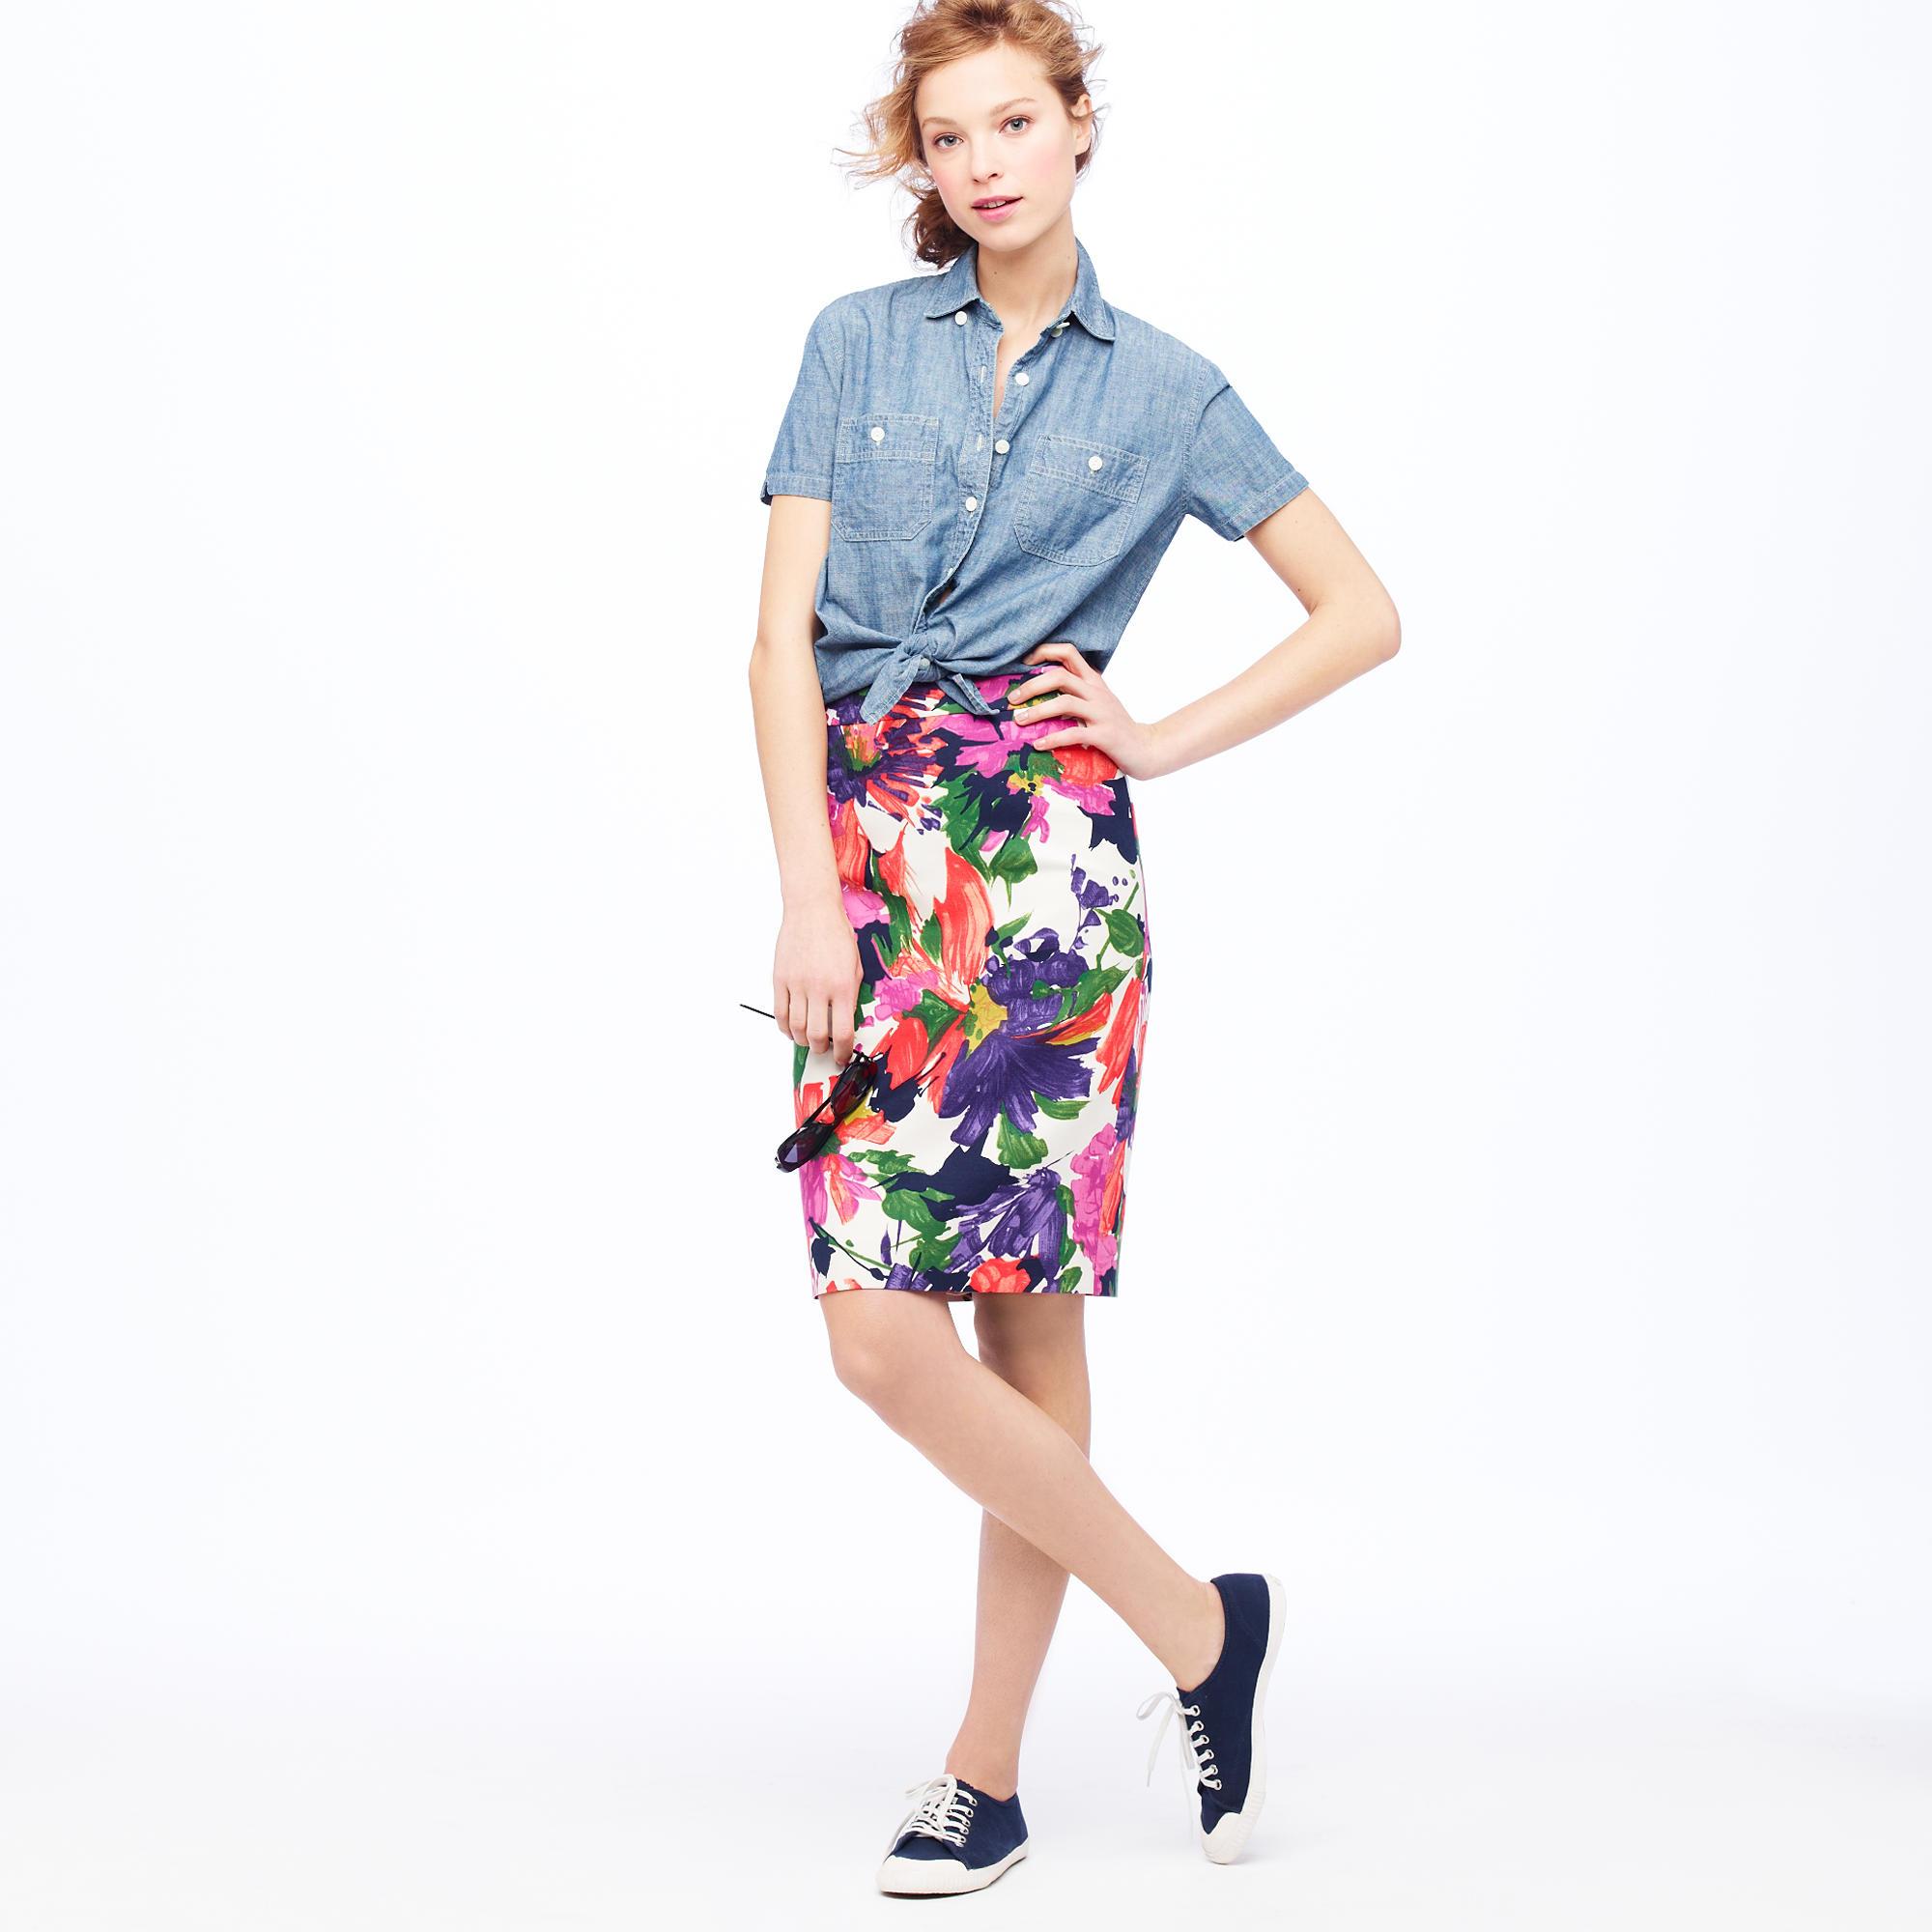 No. 2 pencil skirt in garden floral : Women pencil | J.Crew